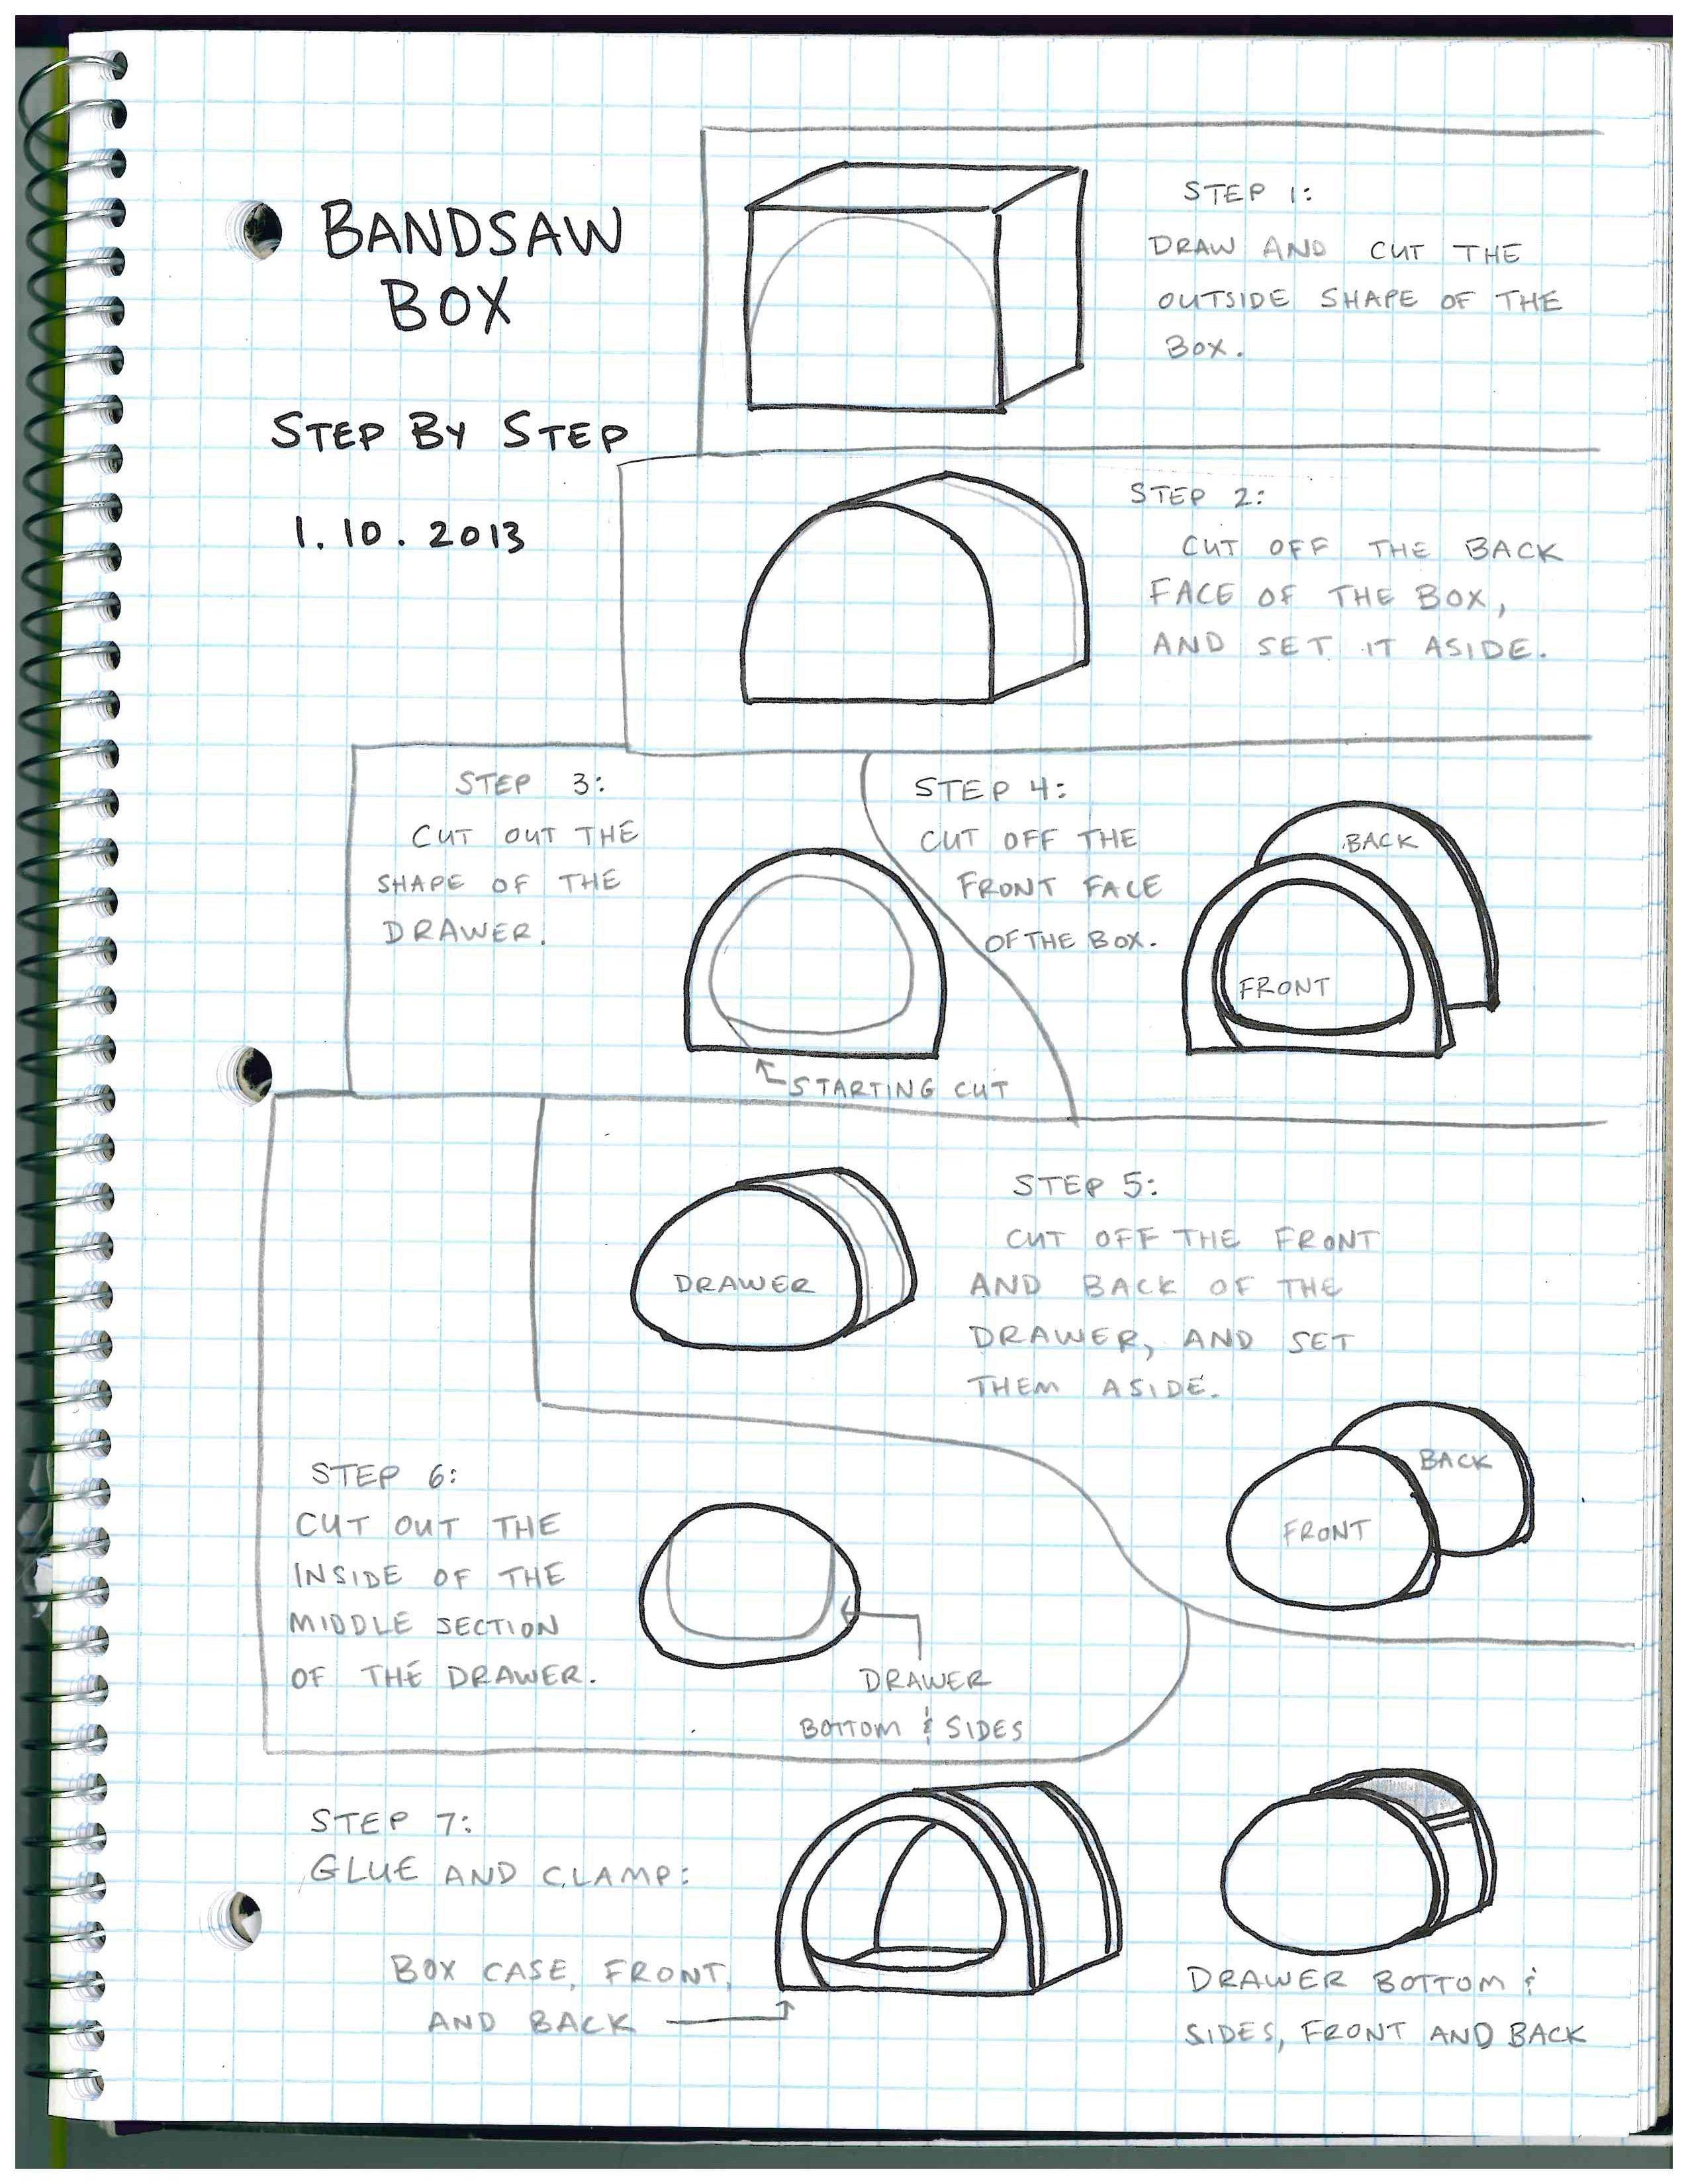 bandsaw boxes diagram electrical wiring diagram symbols rh r2lr1l4r lake victoria info